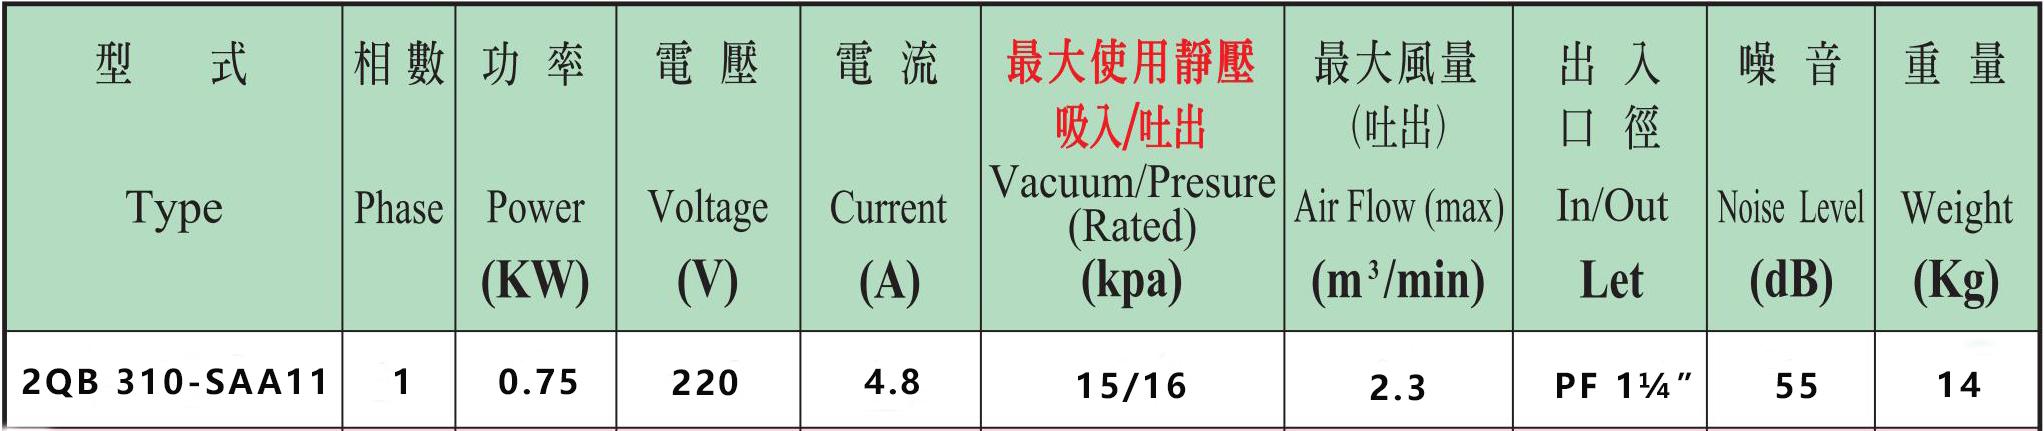 2QB 310-SAA11高压风机性能参数